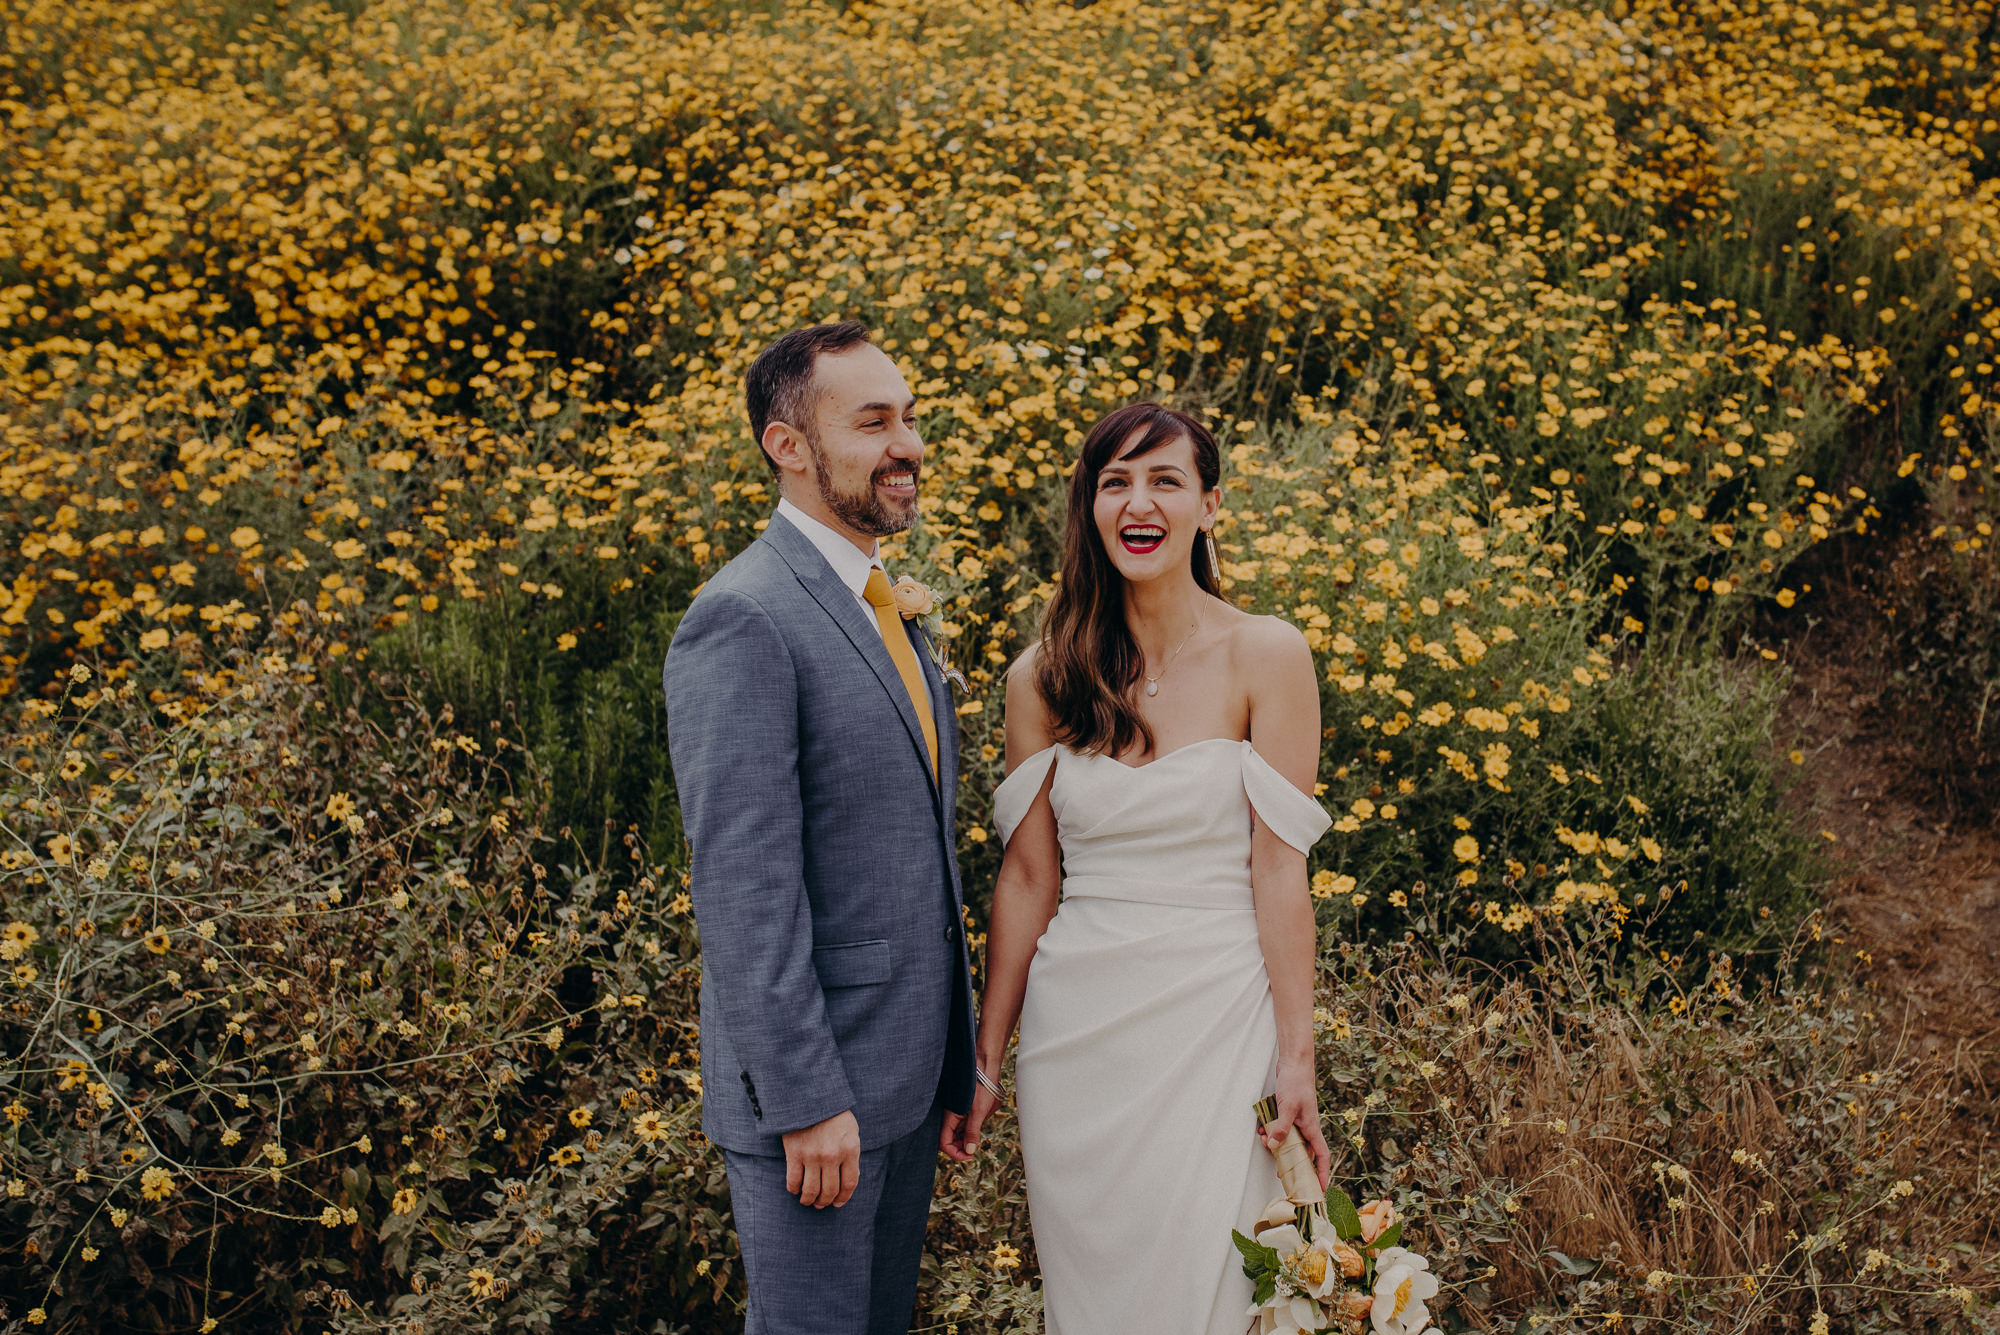 elopement photographer in los angeles - la wedding photographer - isaiahandtaylor.com-020.jpg